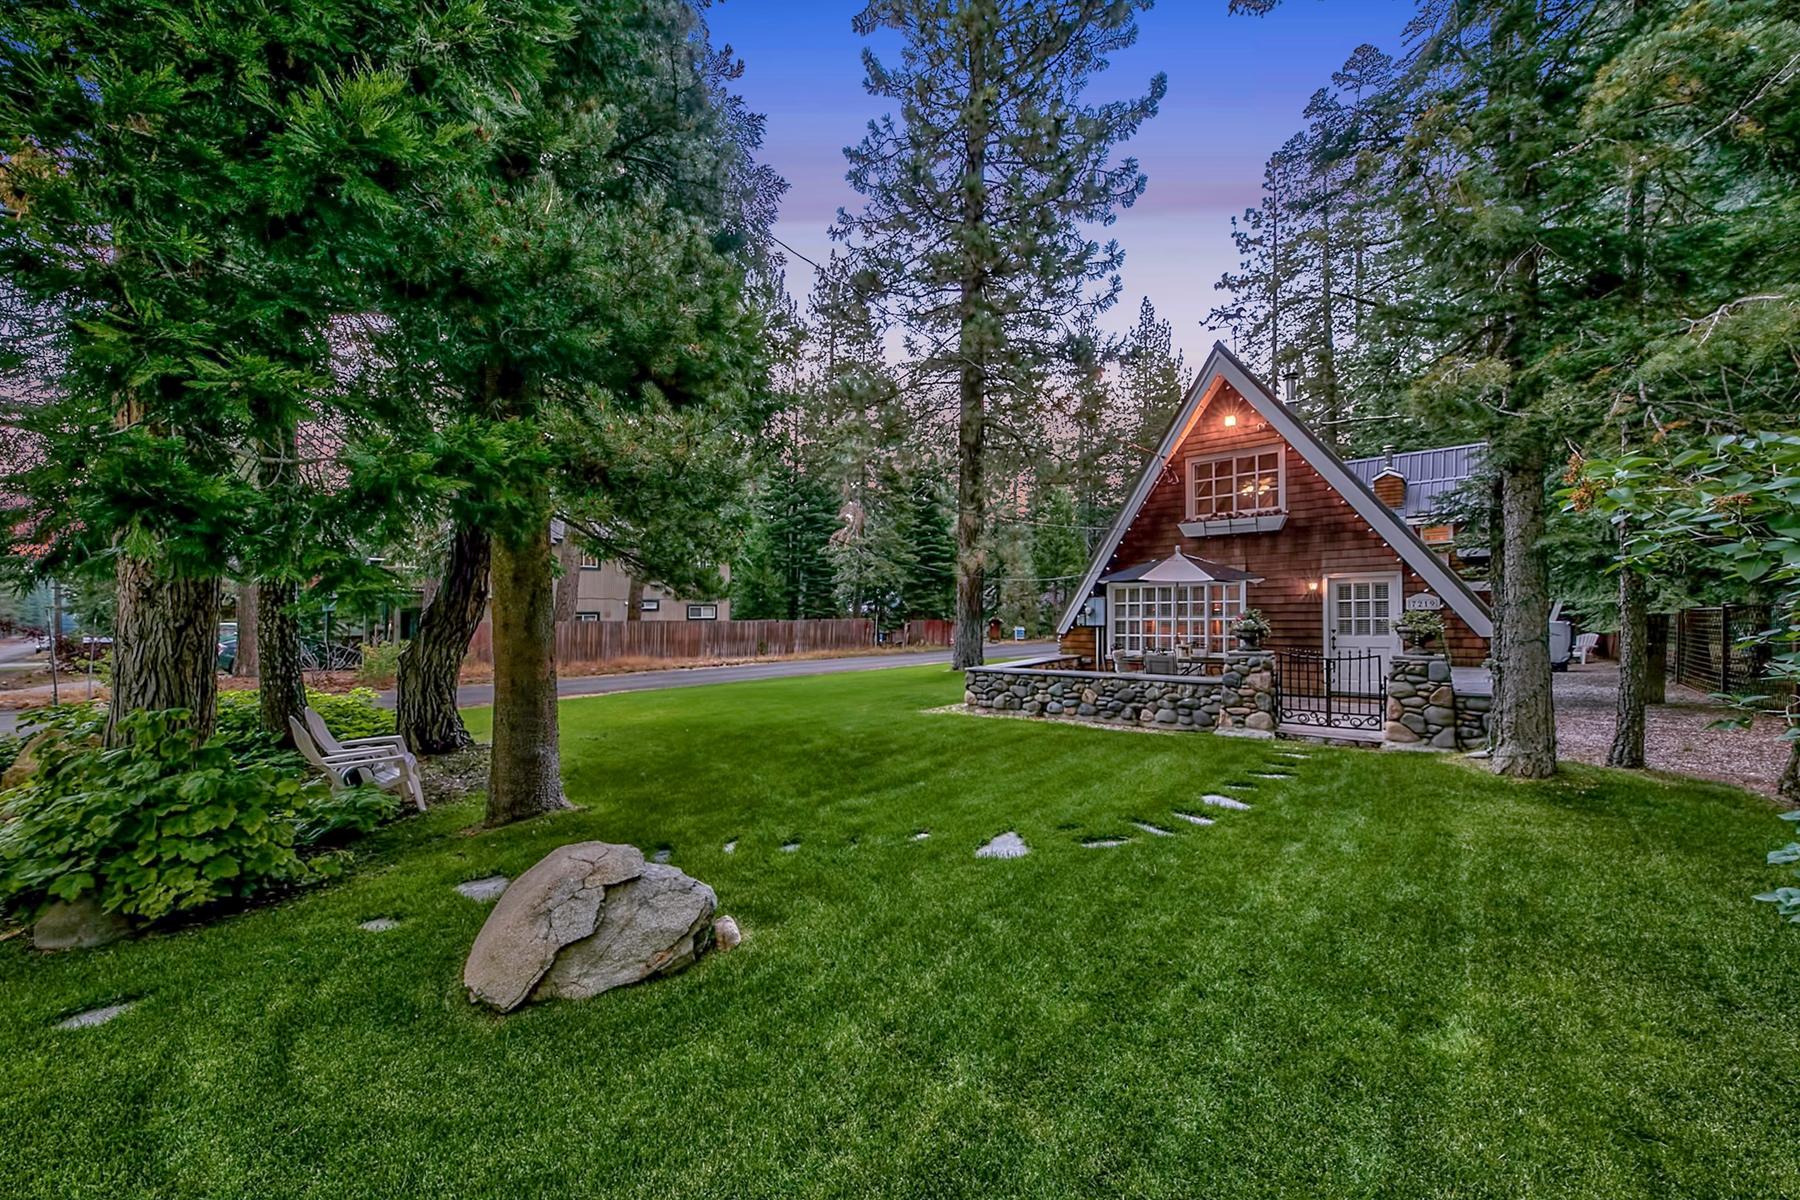 Additional photo for property listing at 7219 4th Avenue, Tahoma, CA 7219 4th Avenue Tahoma, California 96142 United States